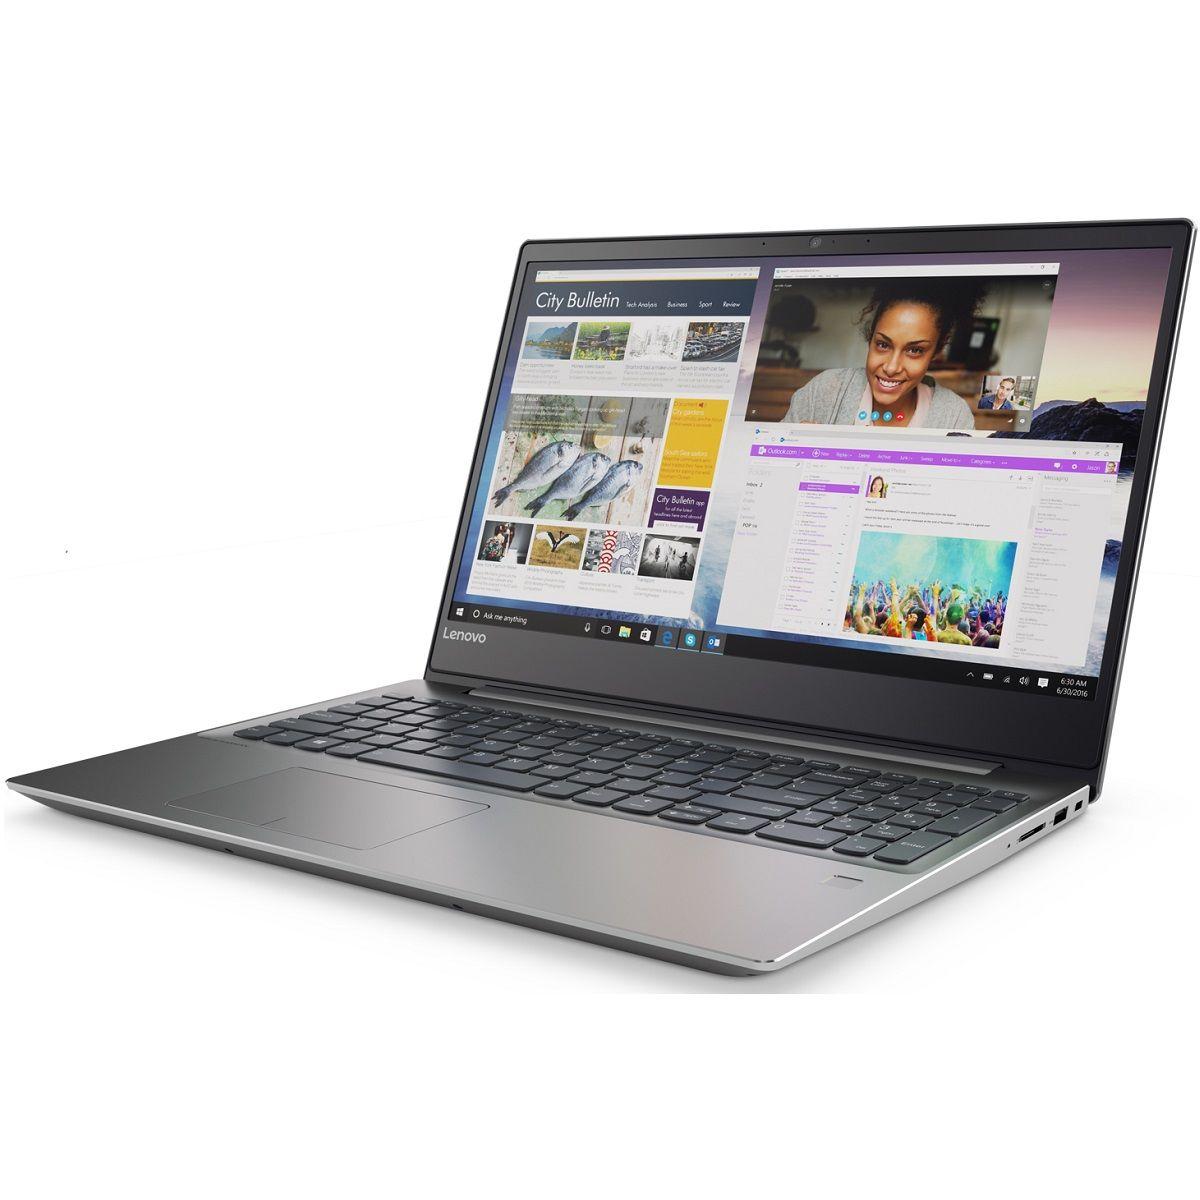 Lenovo IdeaPad 720-15IKB, Grey (81AG000CRK)